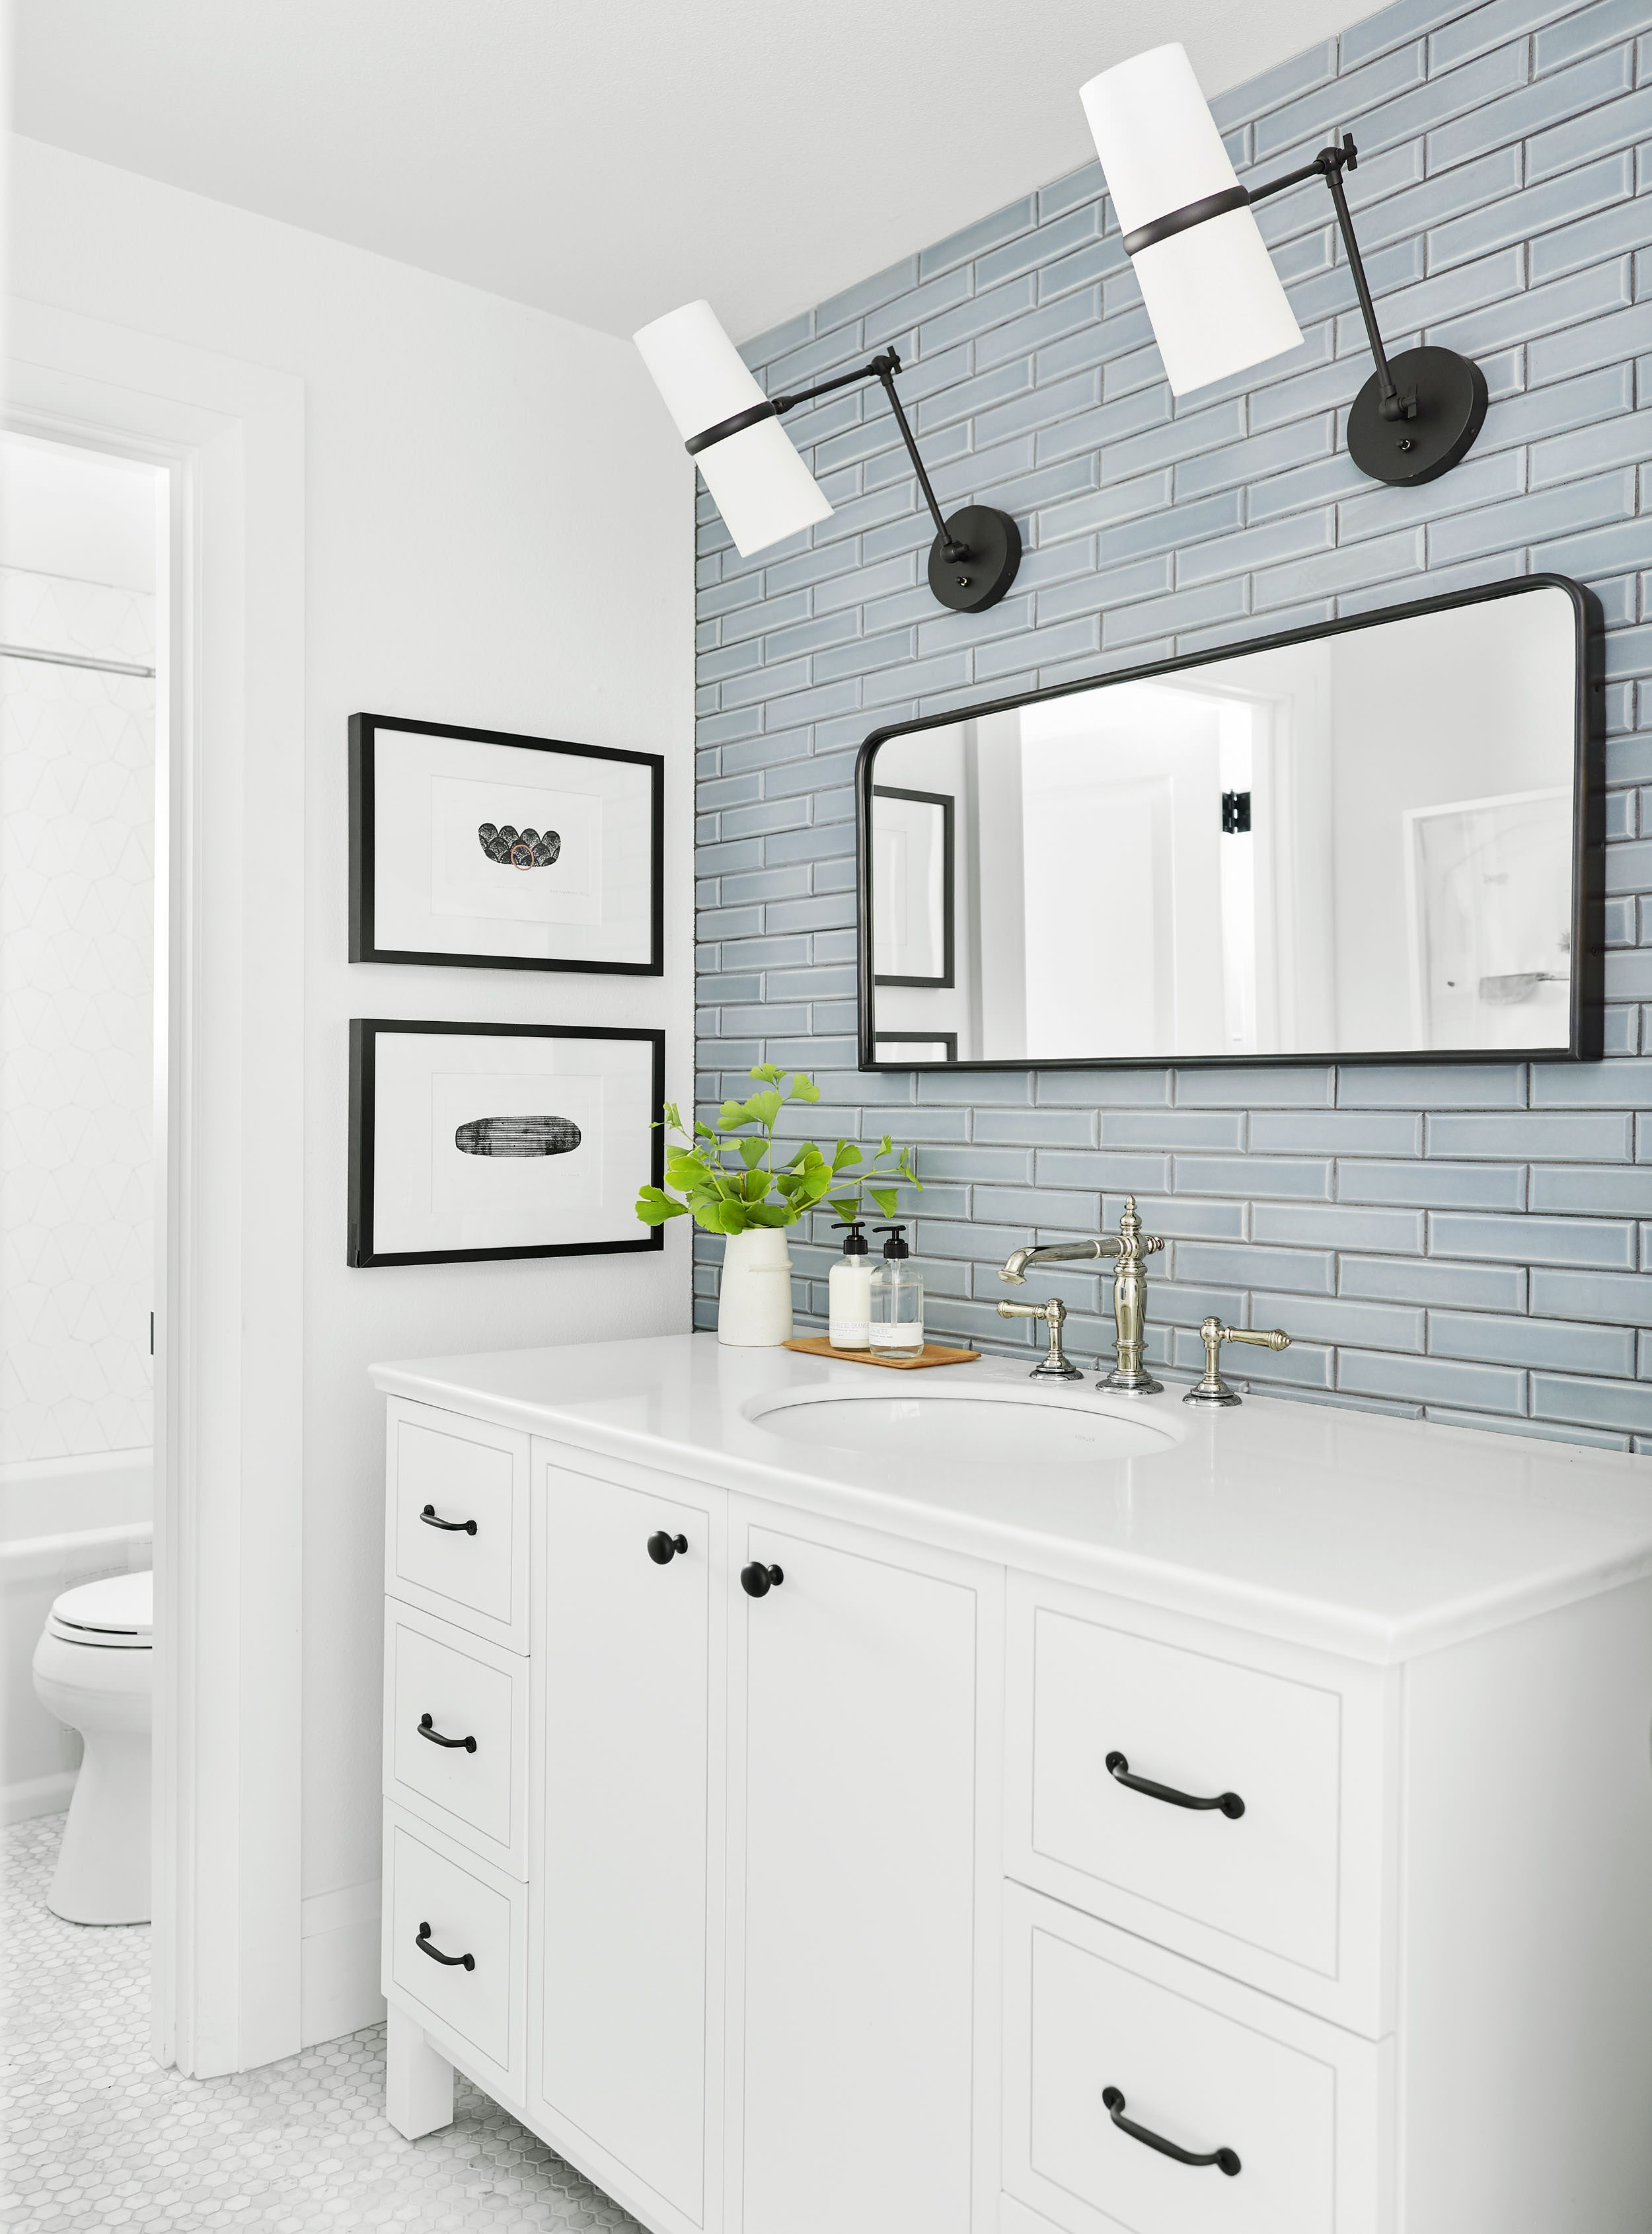 PR- Pratt & Larson - 2x10 bevel P146 - Ceramic - Bathroom.jpg